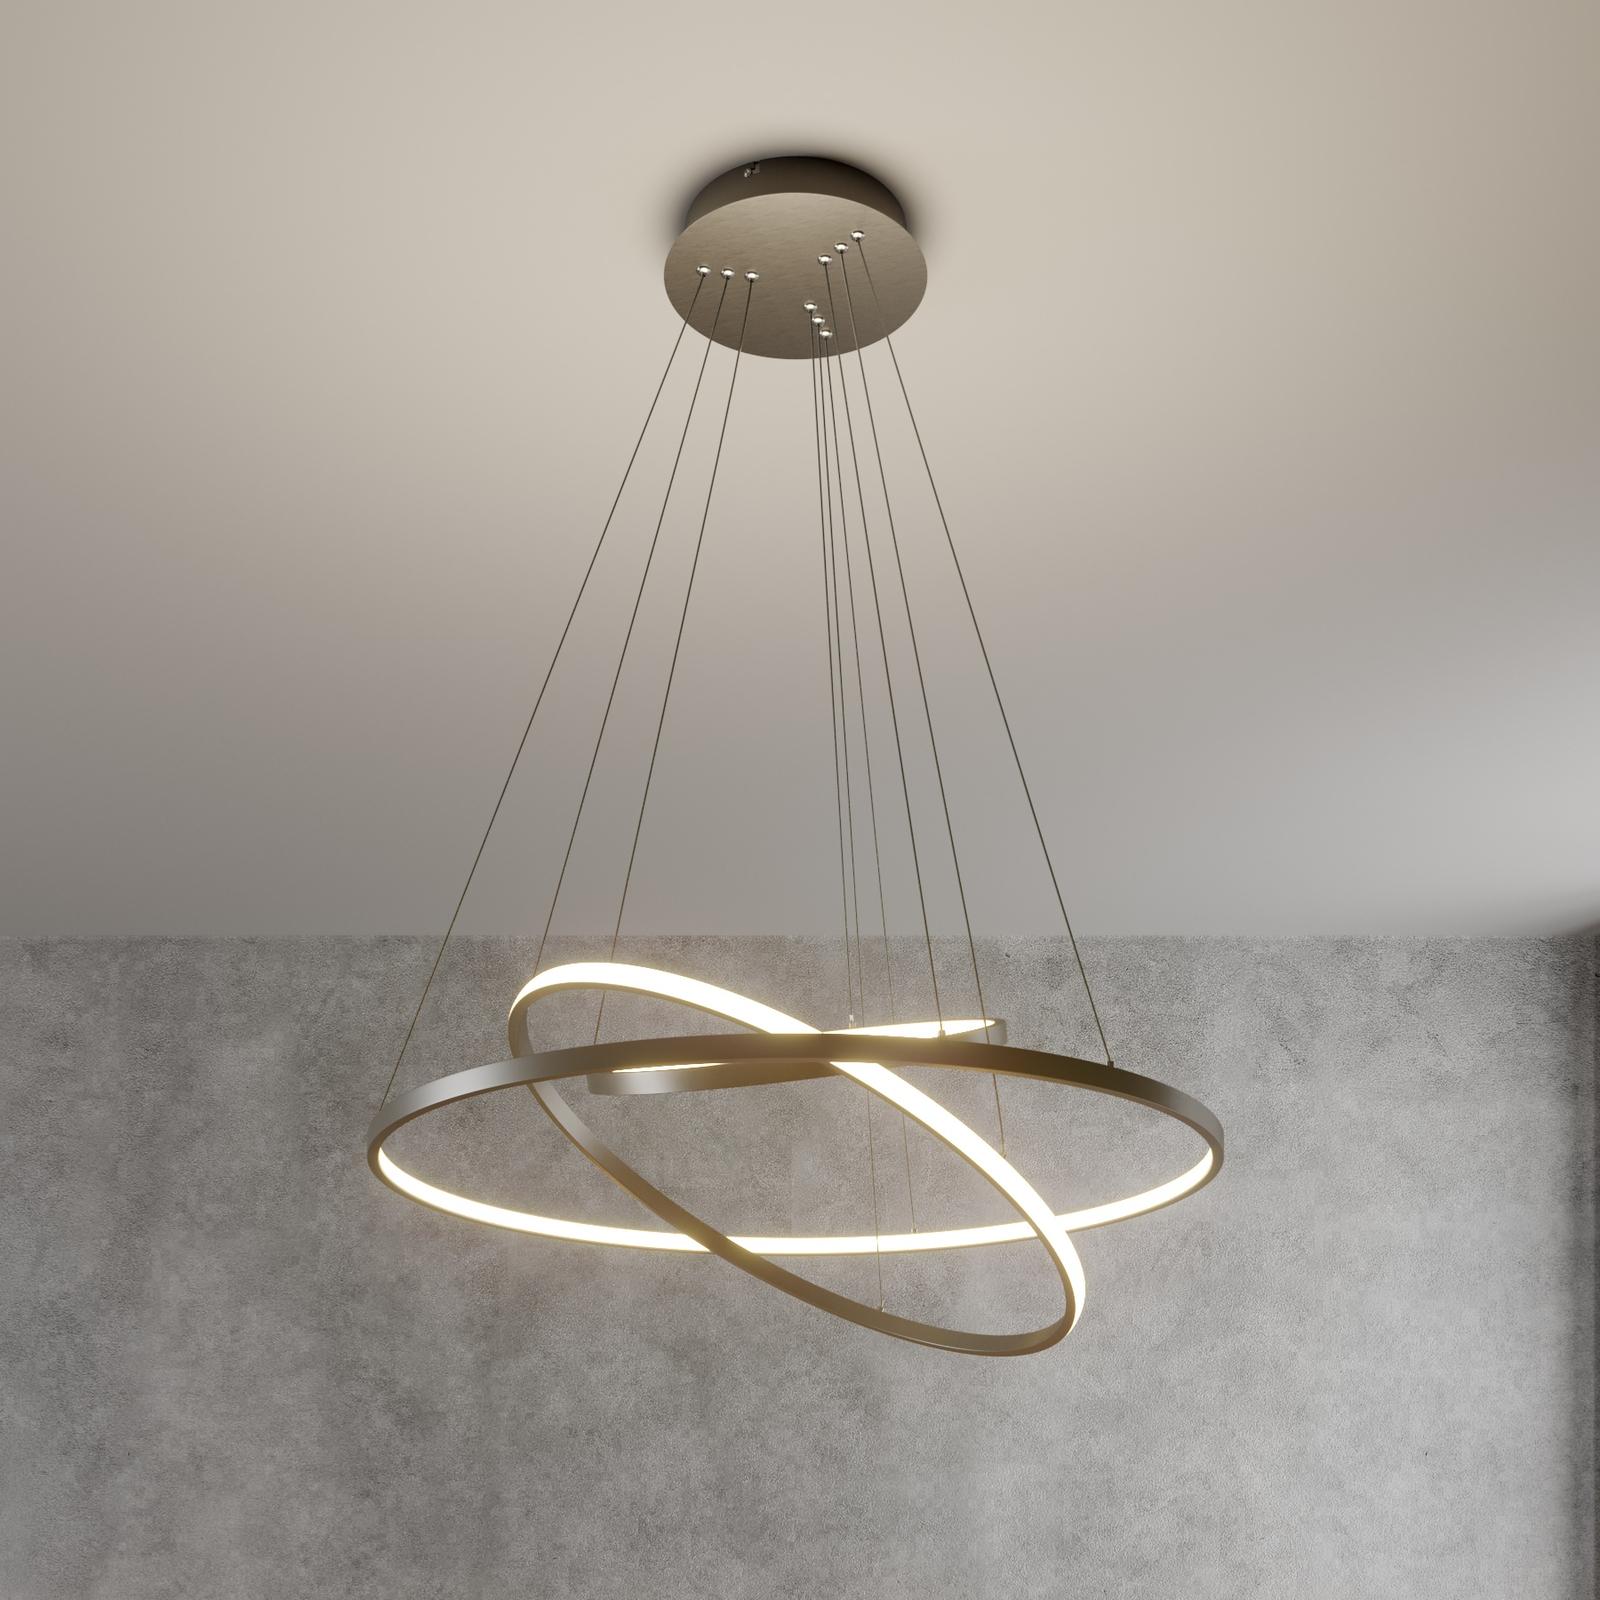 Lámpara colgante LED Ezana tres anillos, níquel